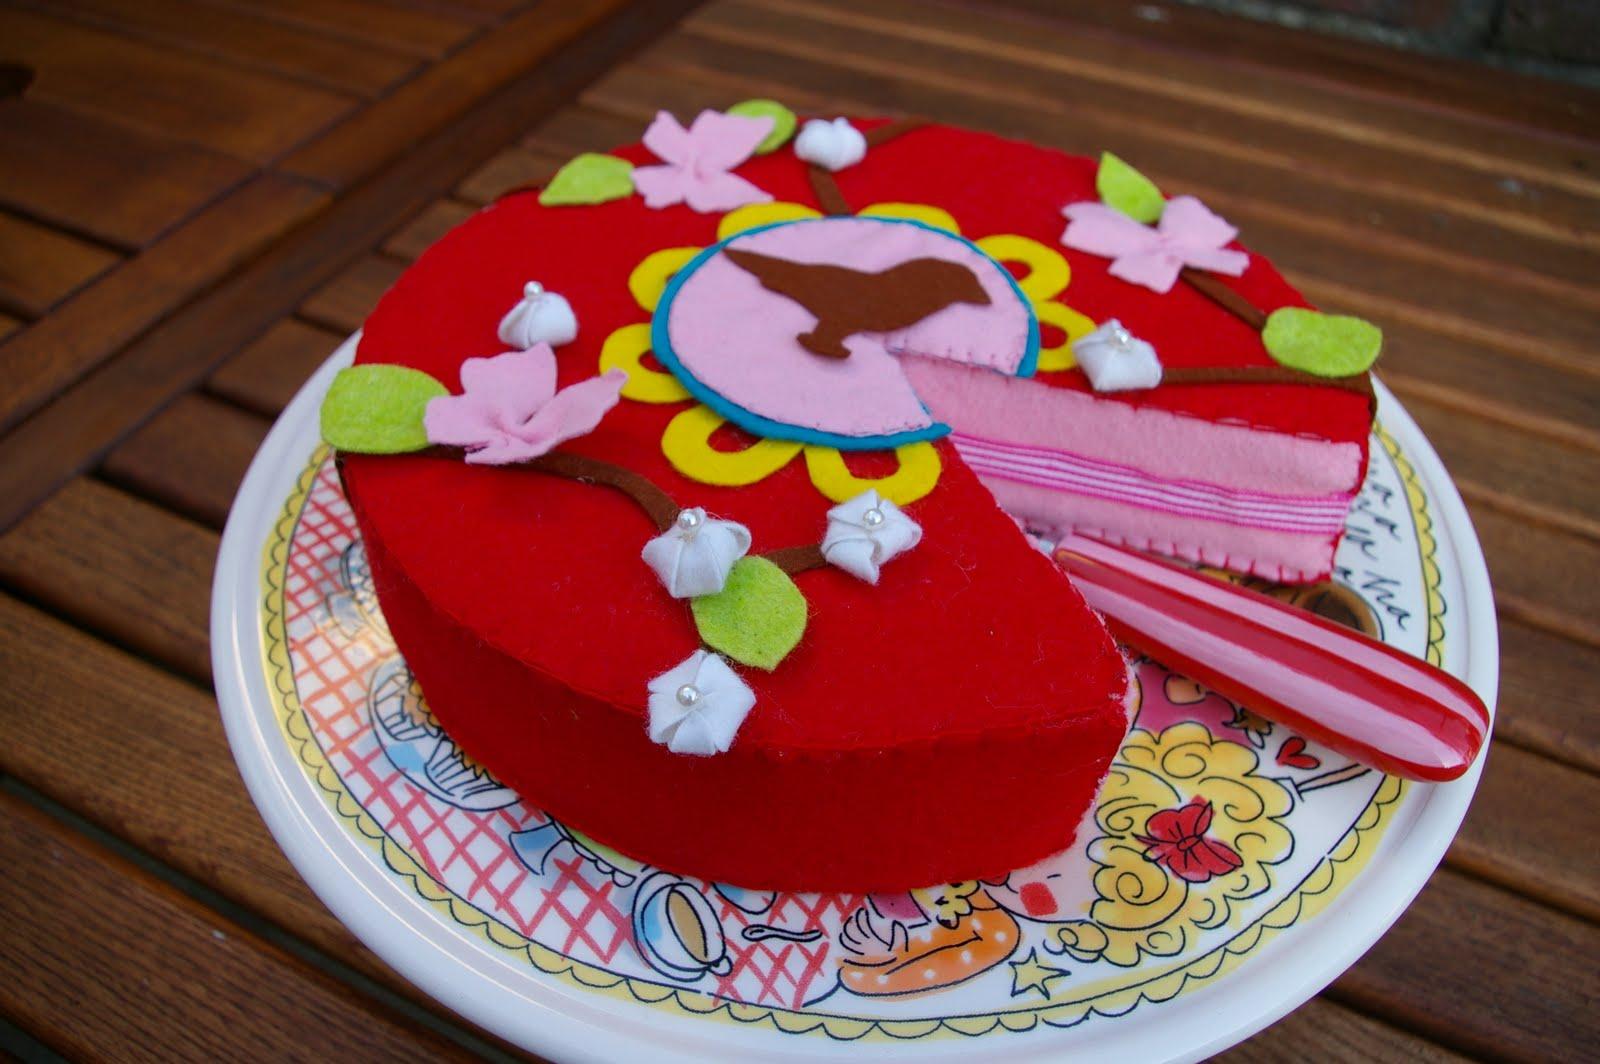 ellen taart Ellen: Pip taart ellen taart